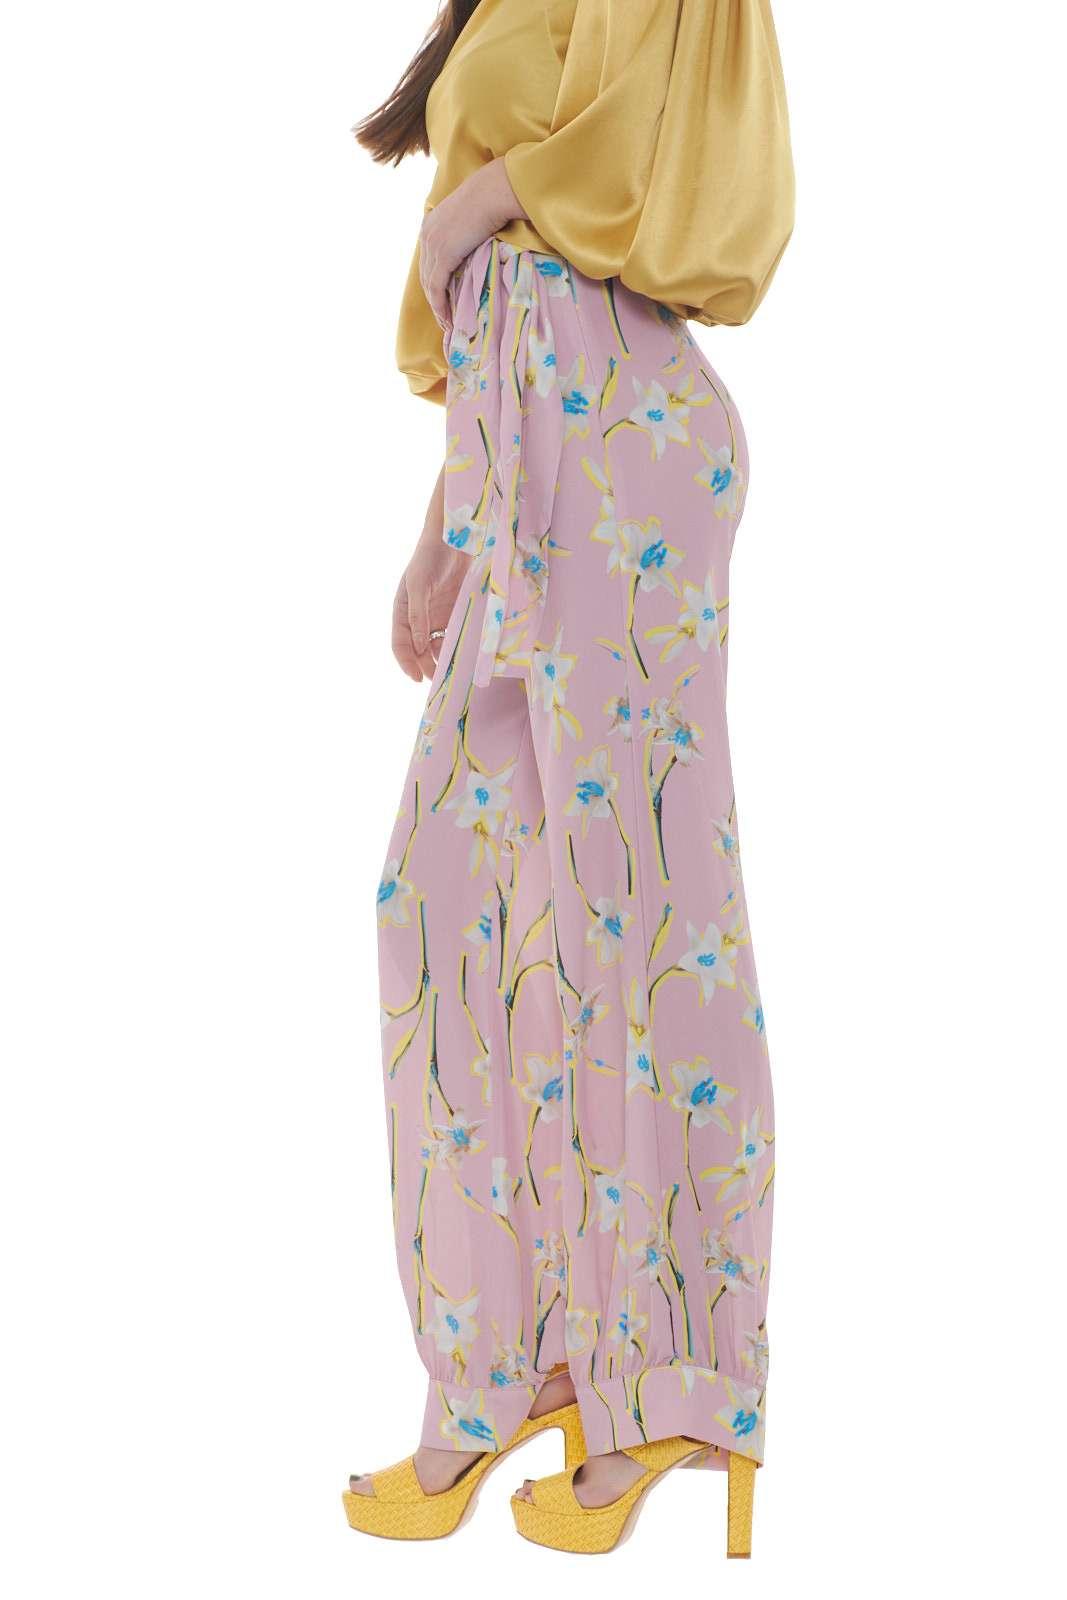 https://www.parmax.com/media/catalog/product/a/i/PE-outlet_parmax-pantaloni-donna-Pinko-1g14kc-B.jpg